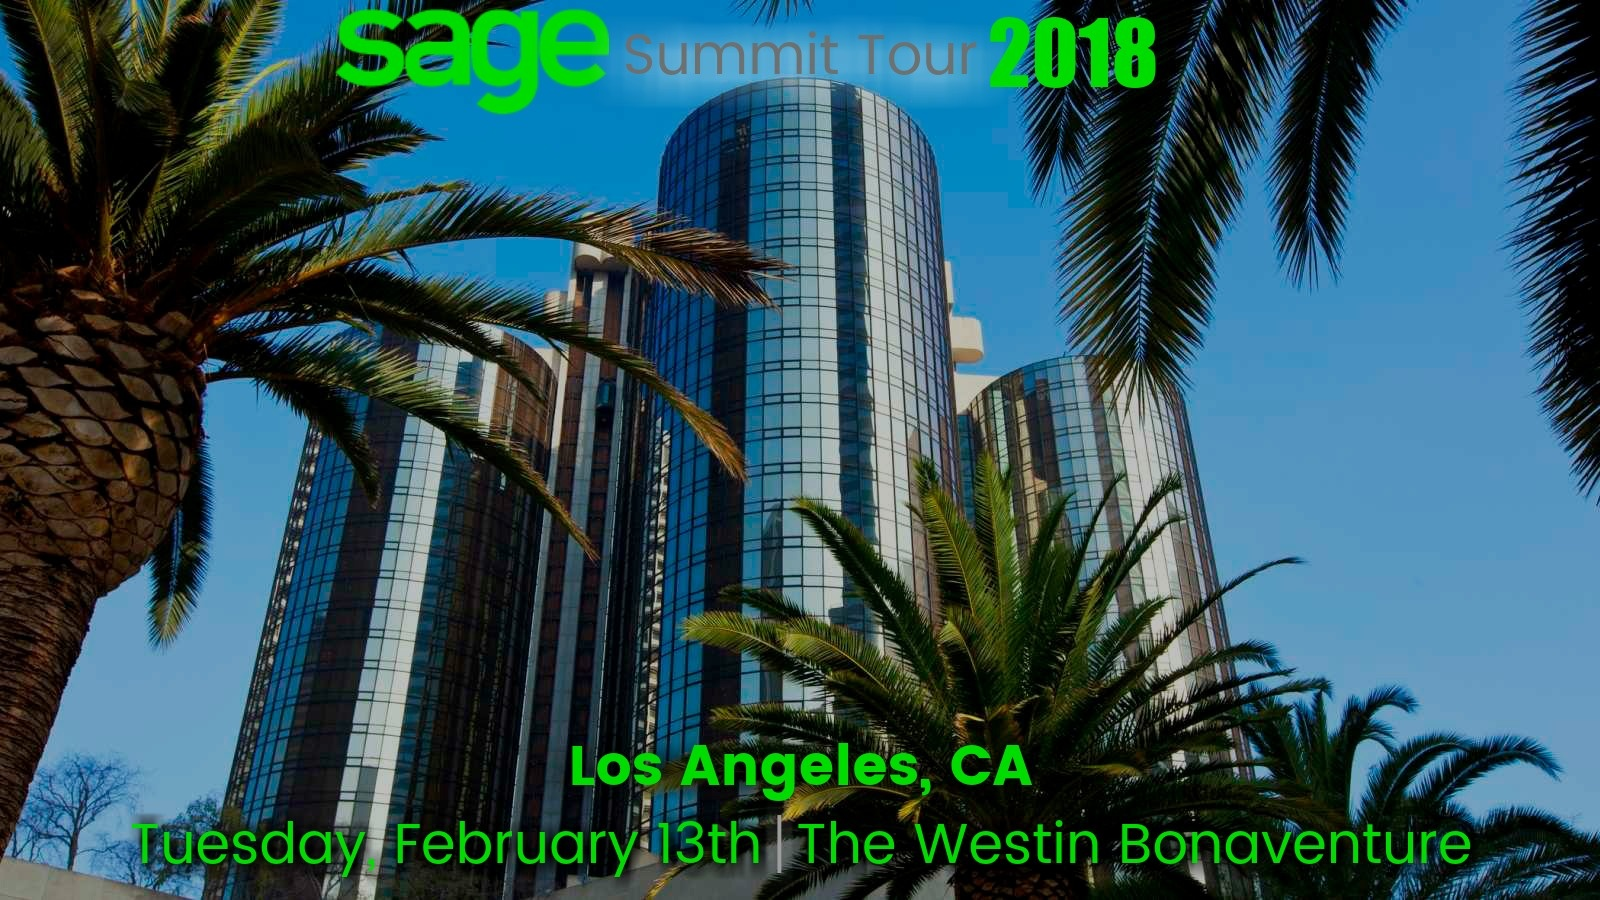 Westin_Bonaventure_Sage_Summit_2018_Los_Angeles 2.0.jpg